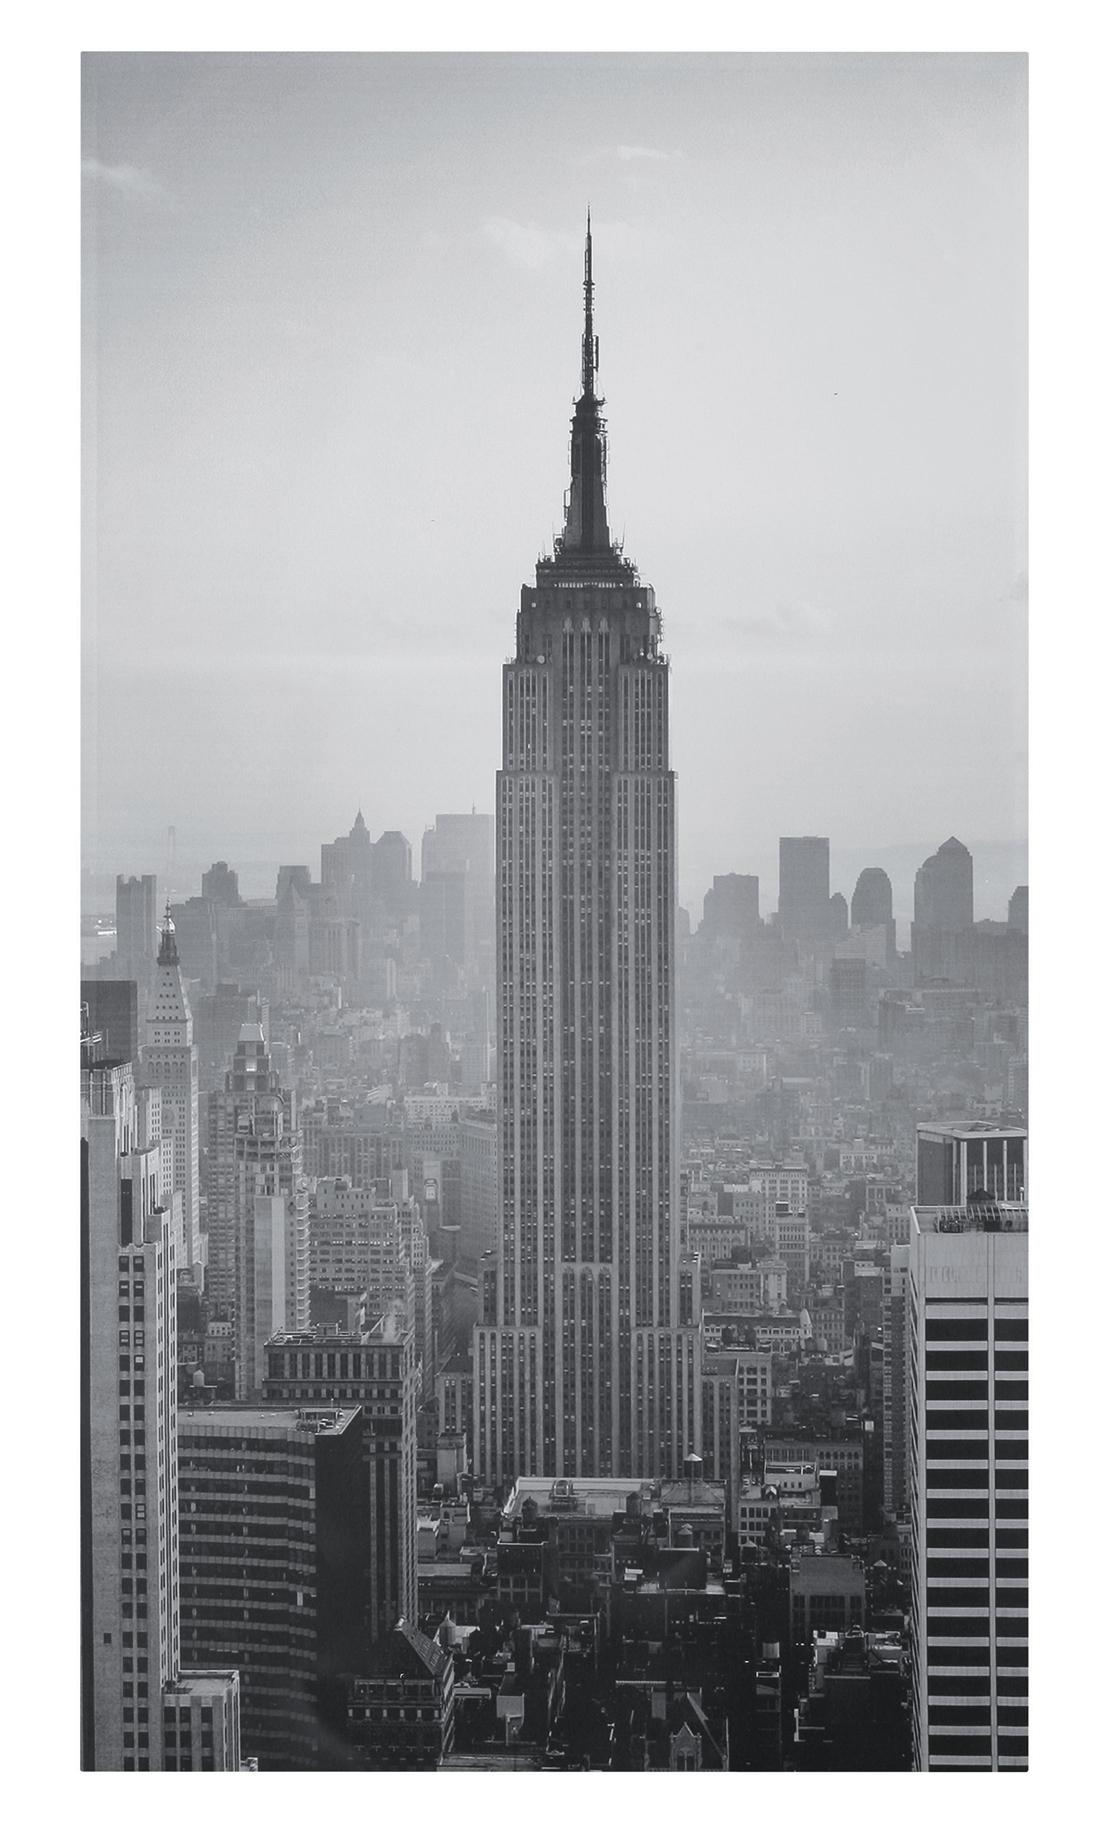 empire state building manhattan new york leinwand schwarz wei neu ovp ebay. Black Bedroom Furniture Sets. Home Design Ideas